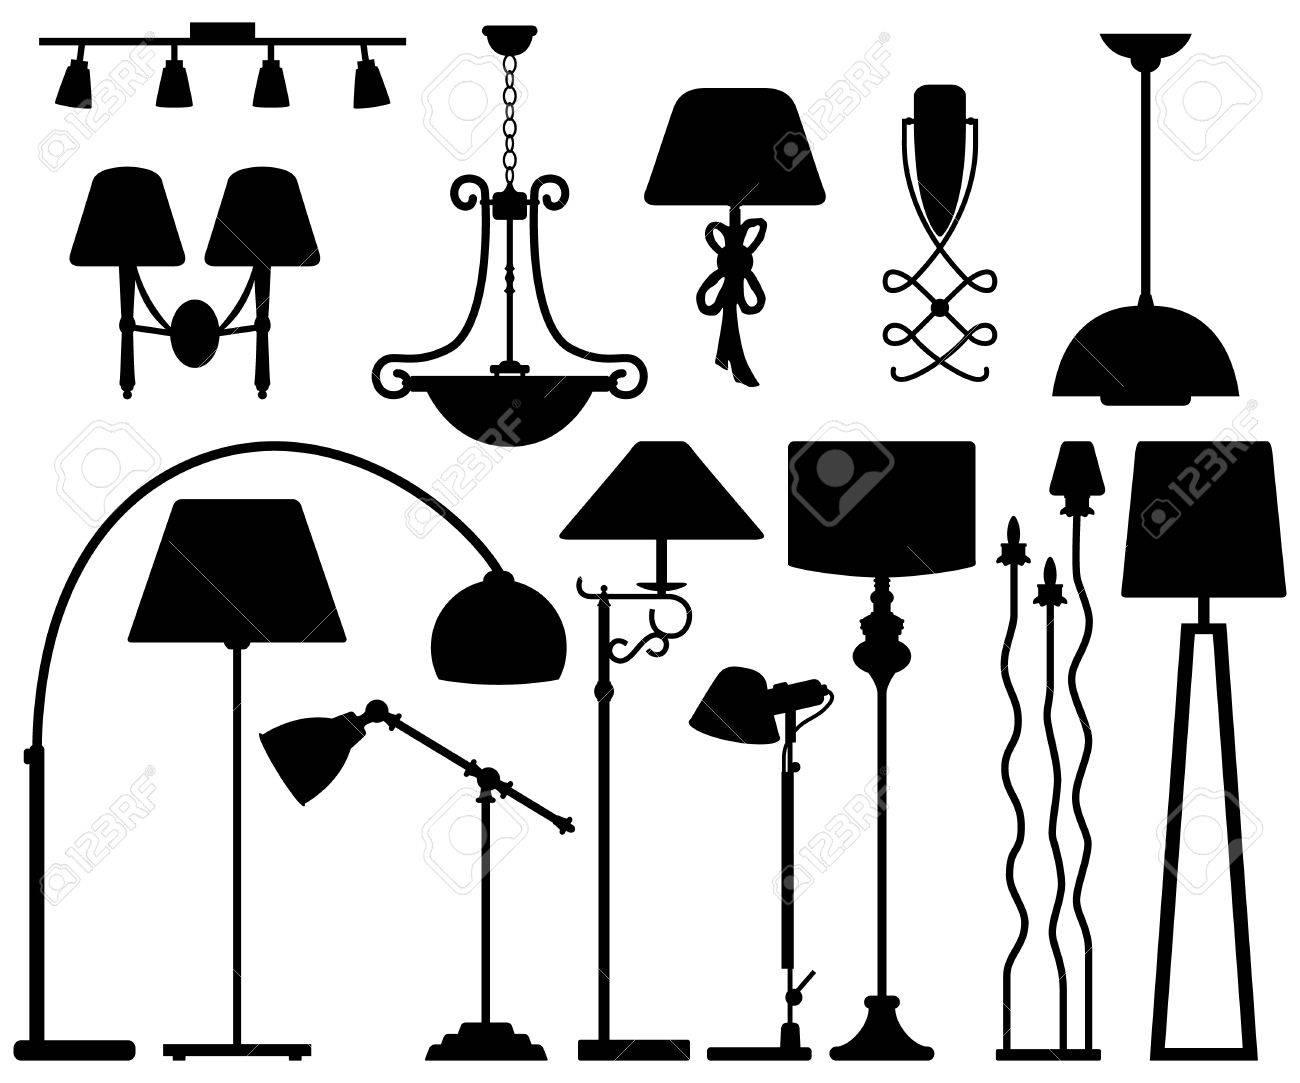 Lamp Design for Floor Ceiling Wall Stock Vector - 18812001